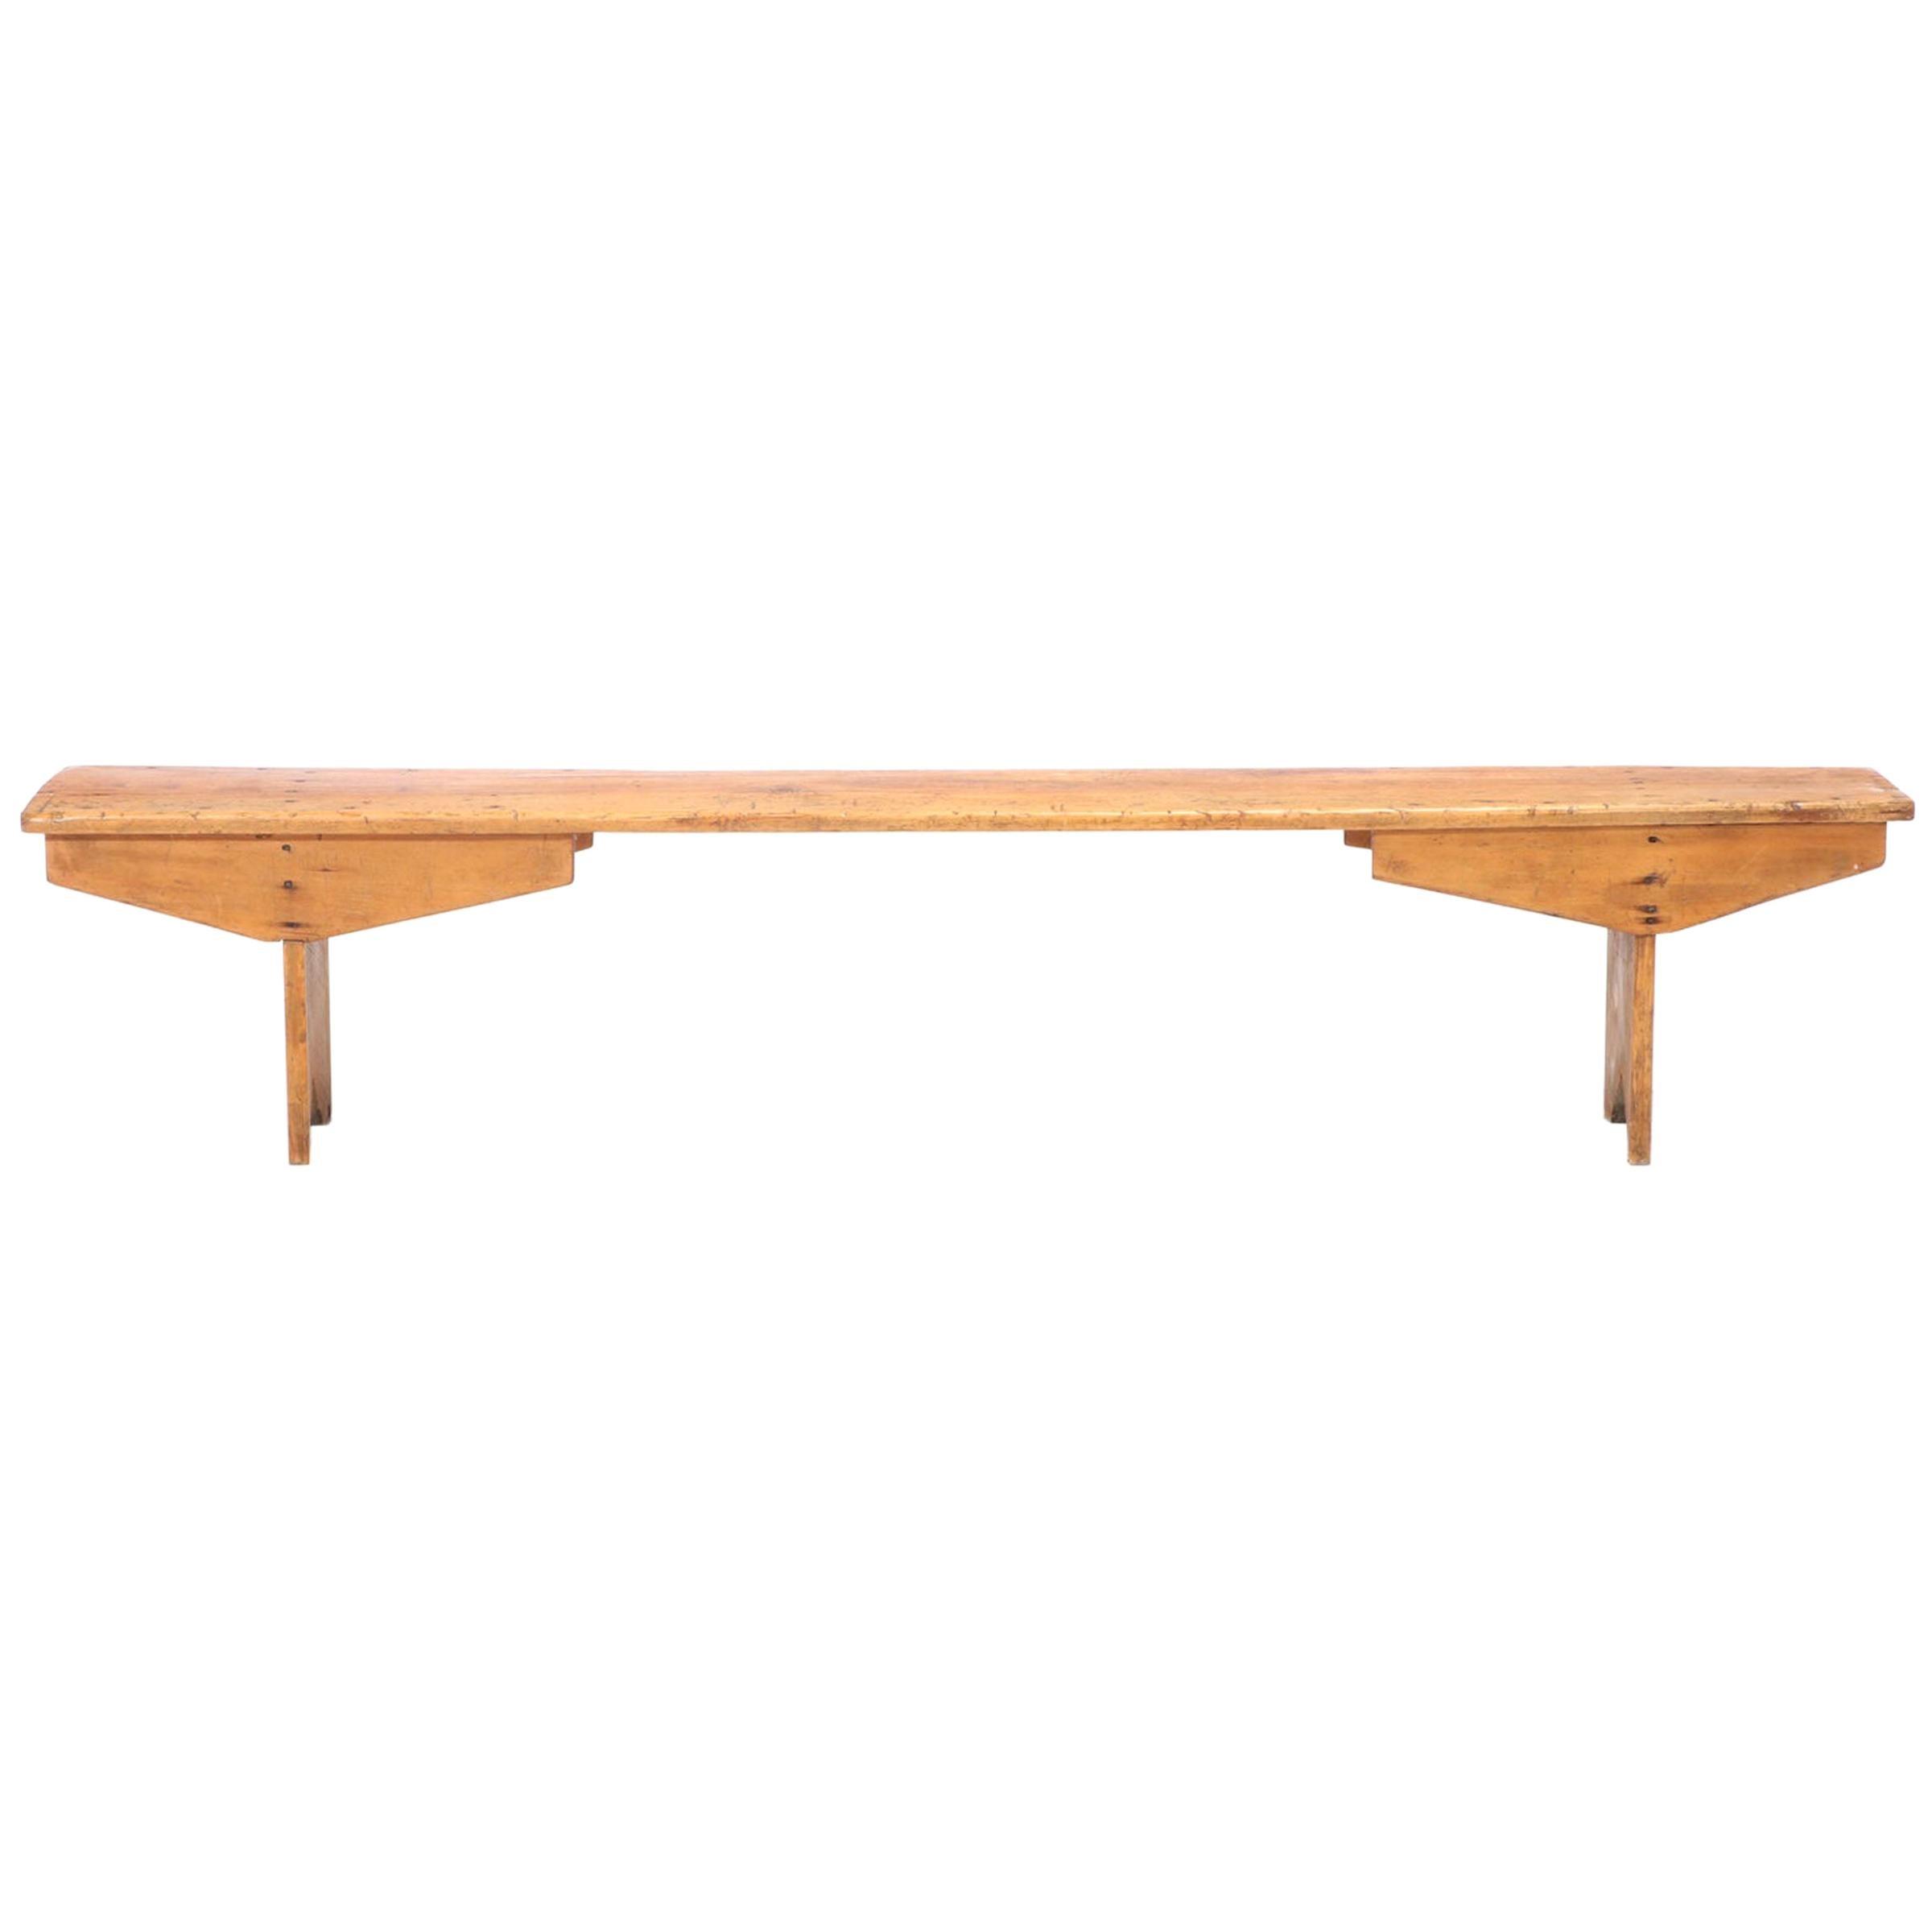 19th Century American Pine Bench